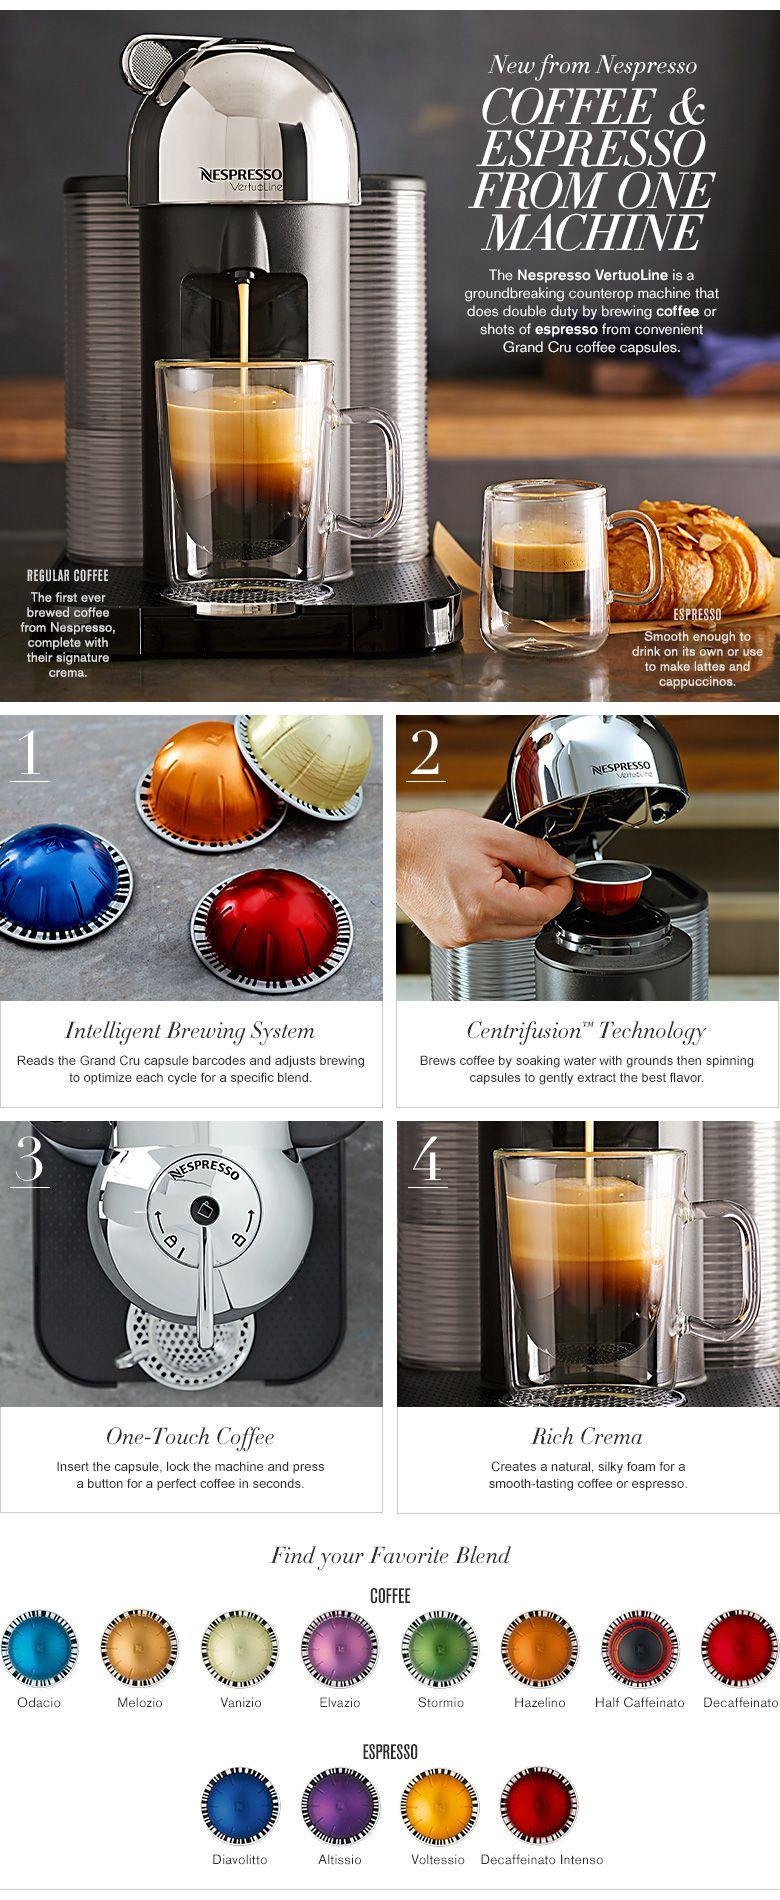 My new investment! 😀 nespresso vertuo Vertuoline